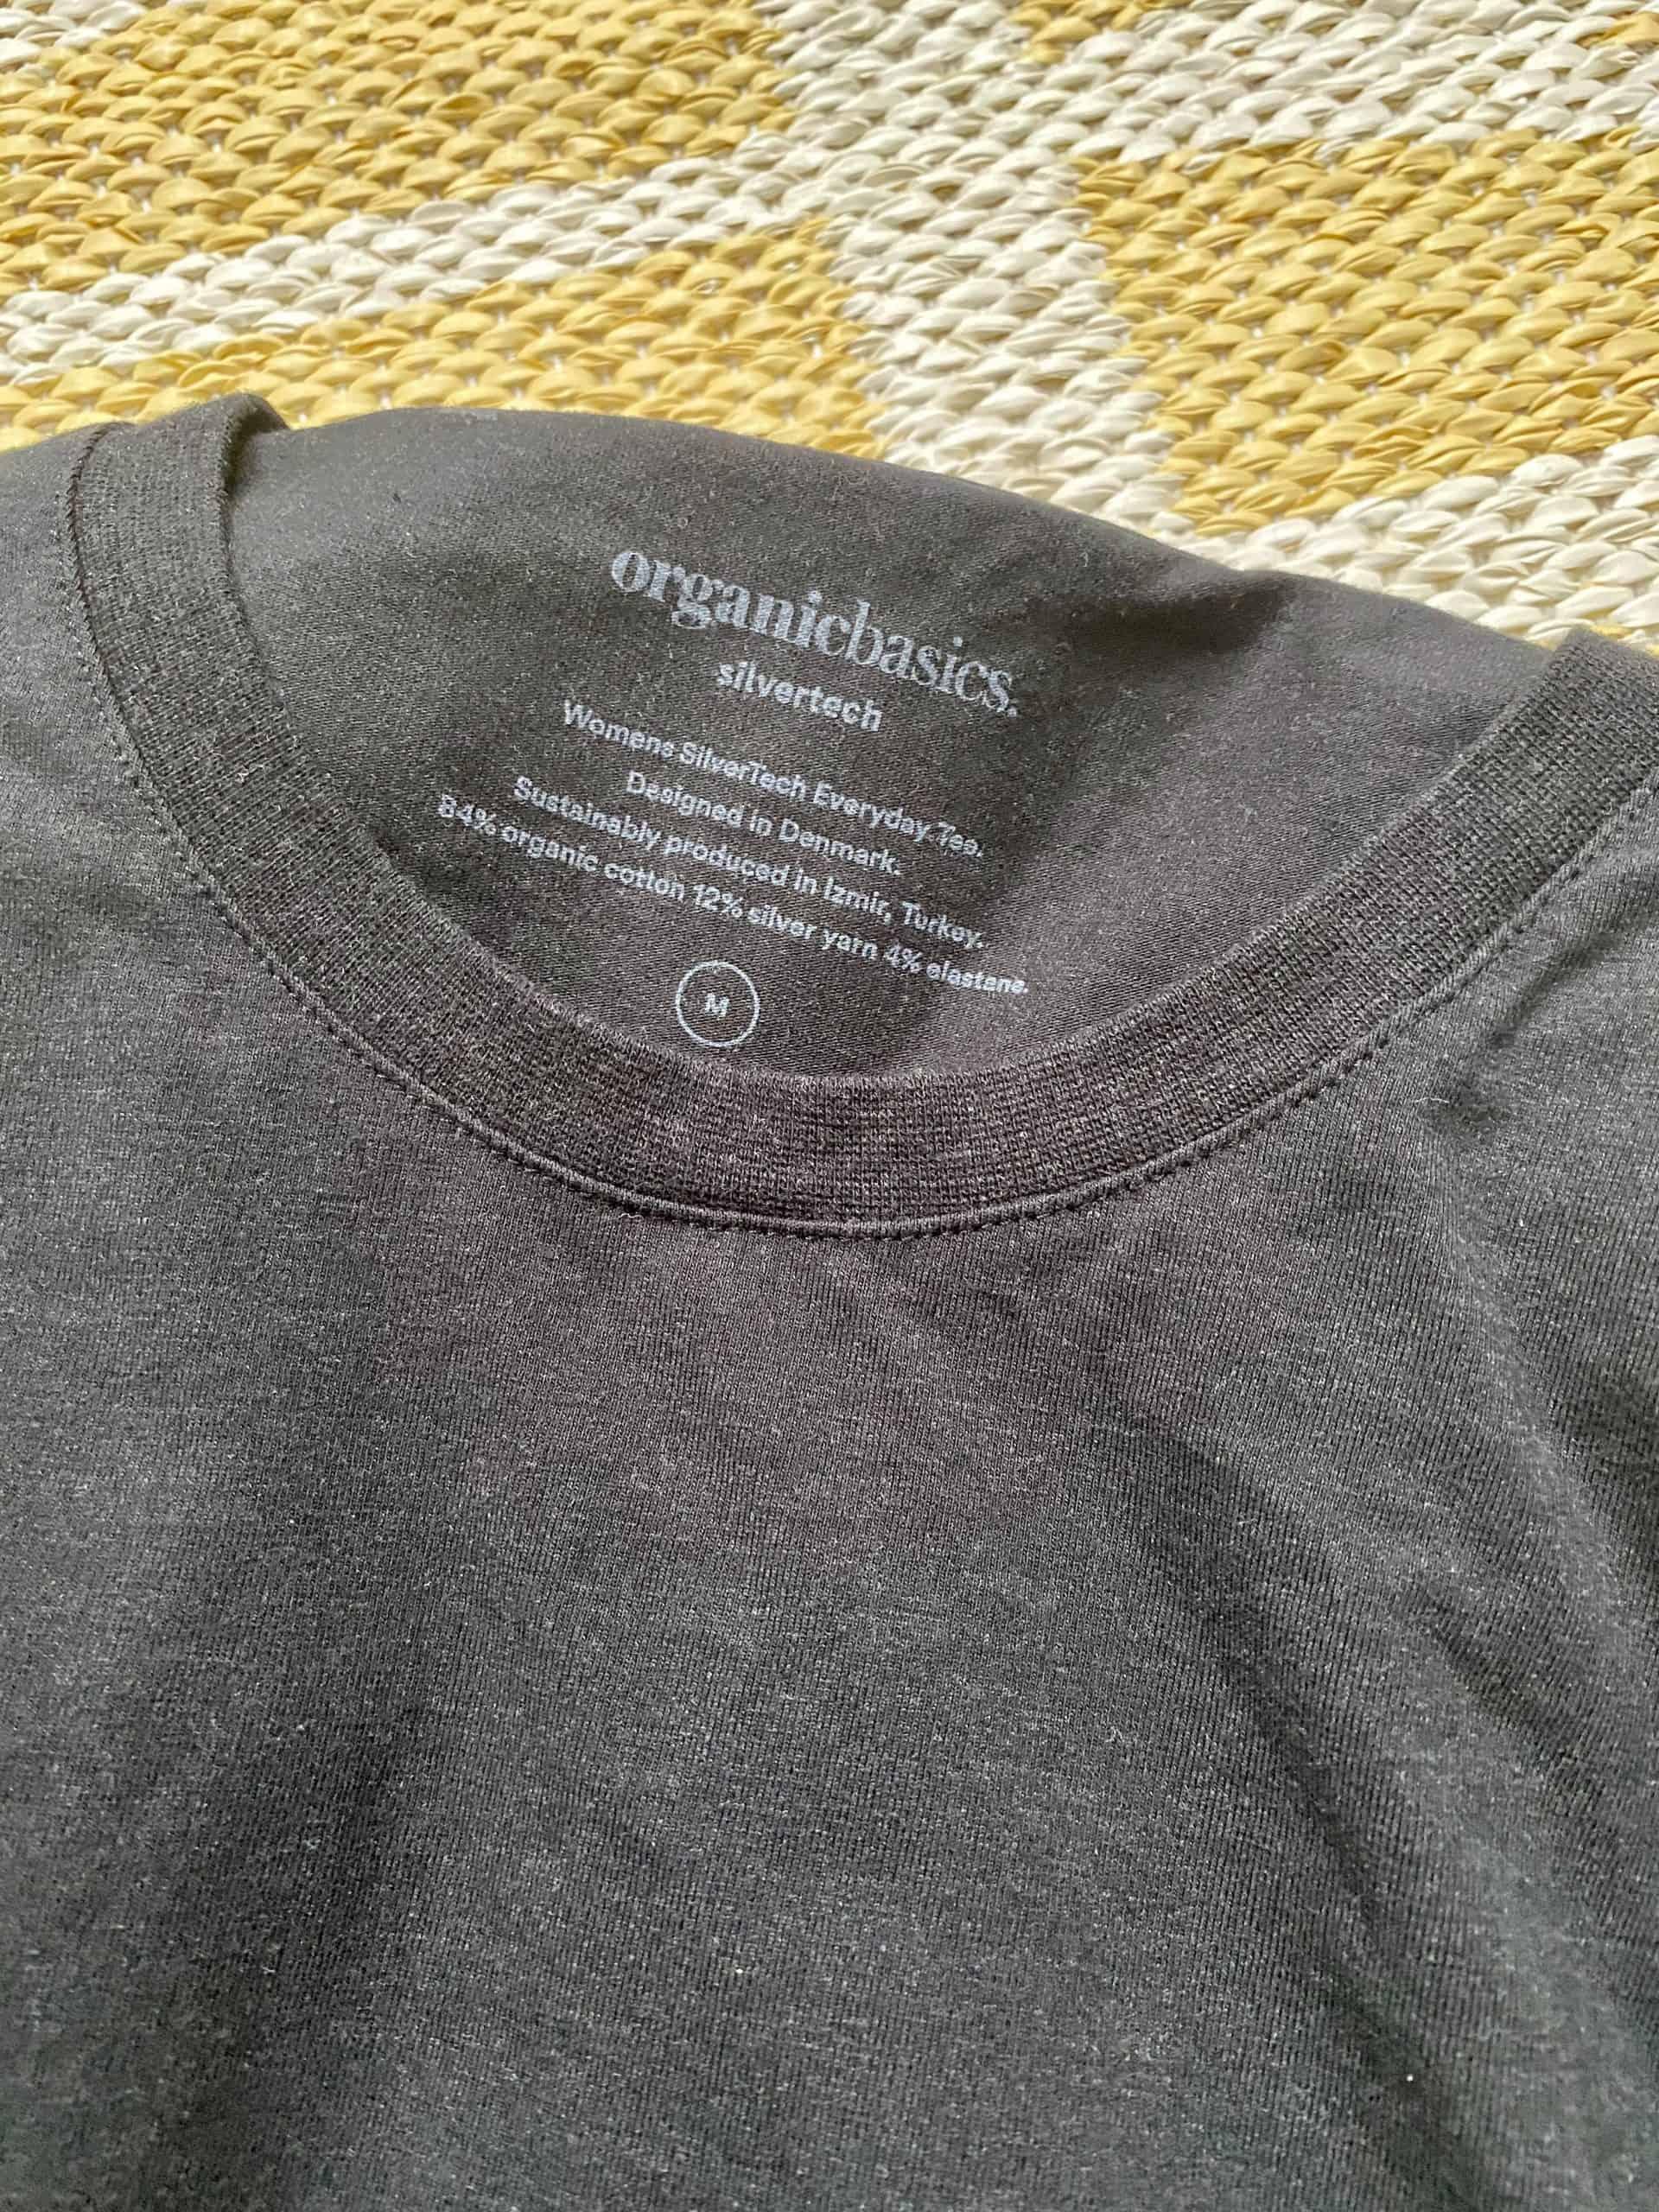 organic basics review silvertech tshirt womens